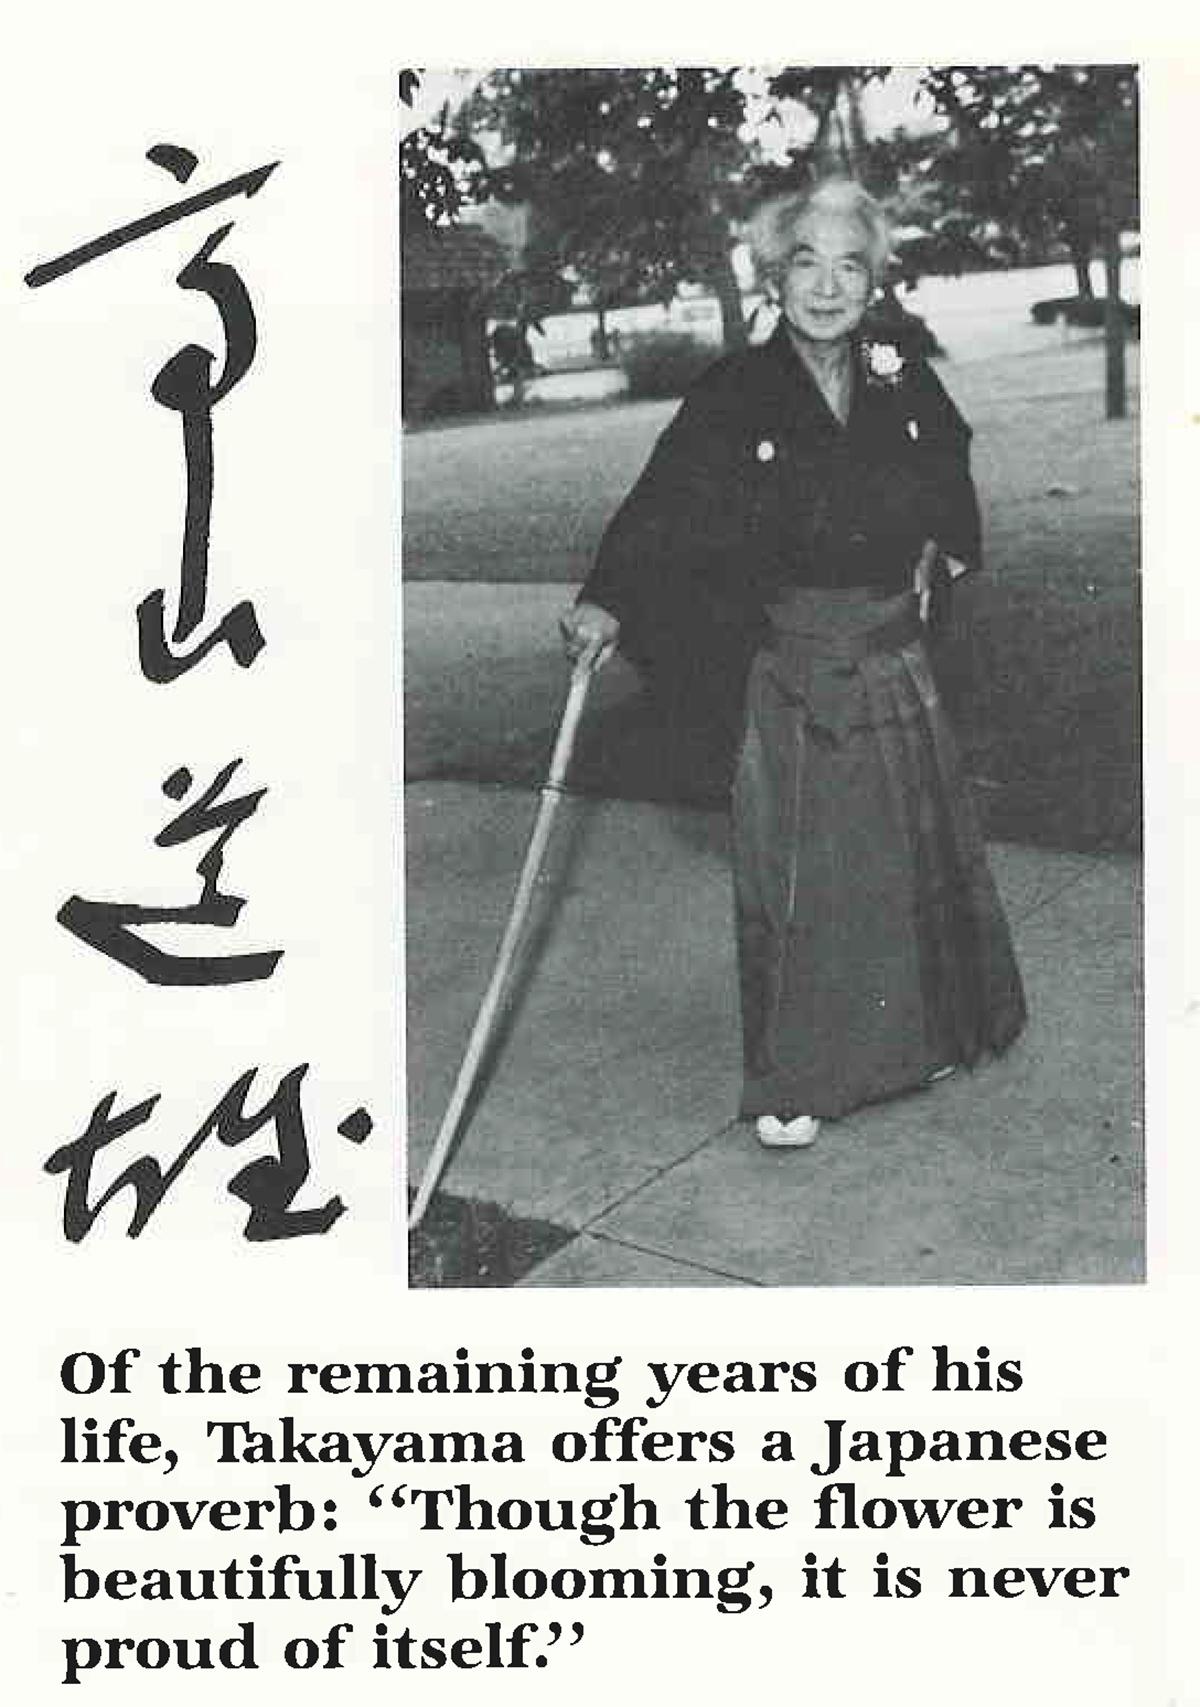 Michio Takayama